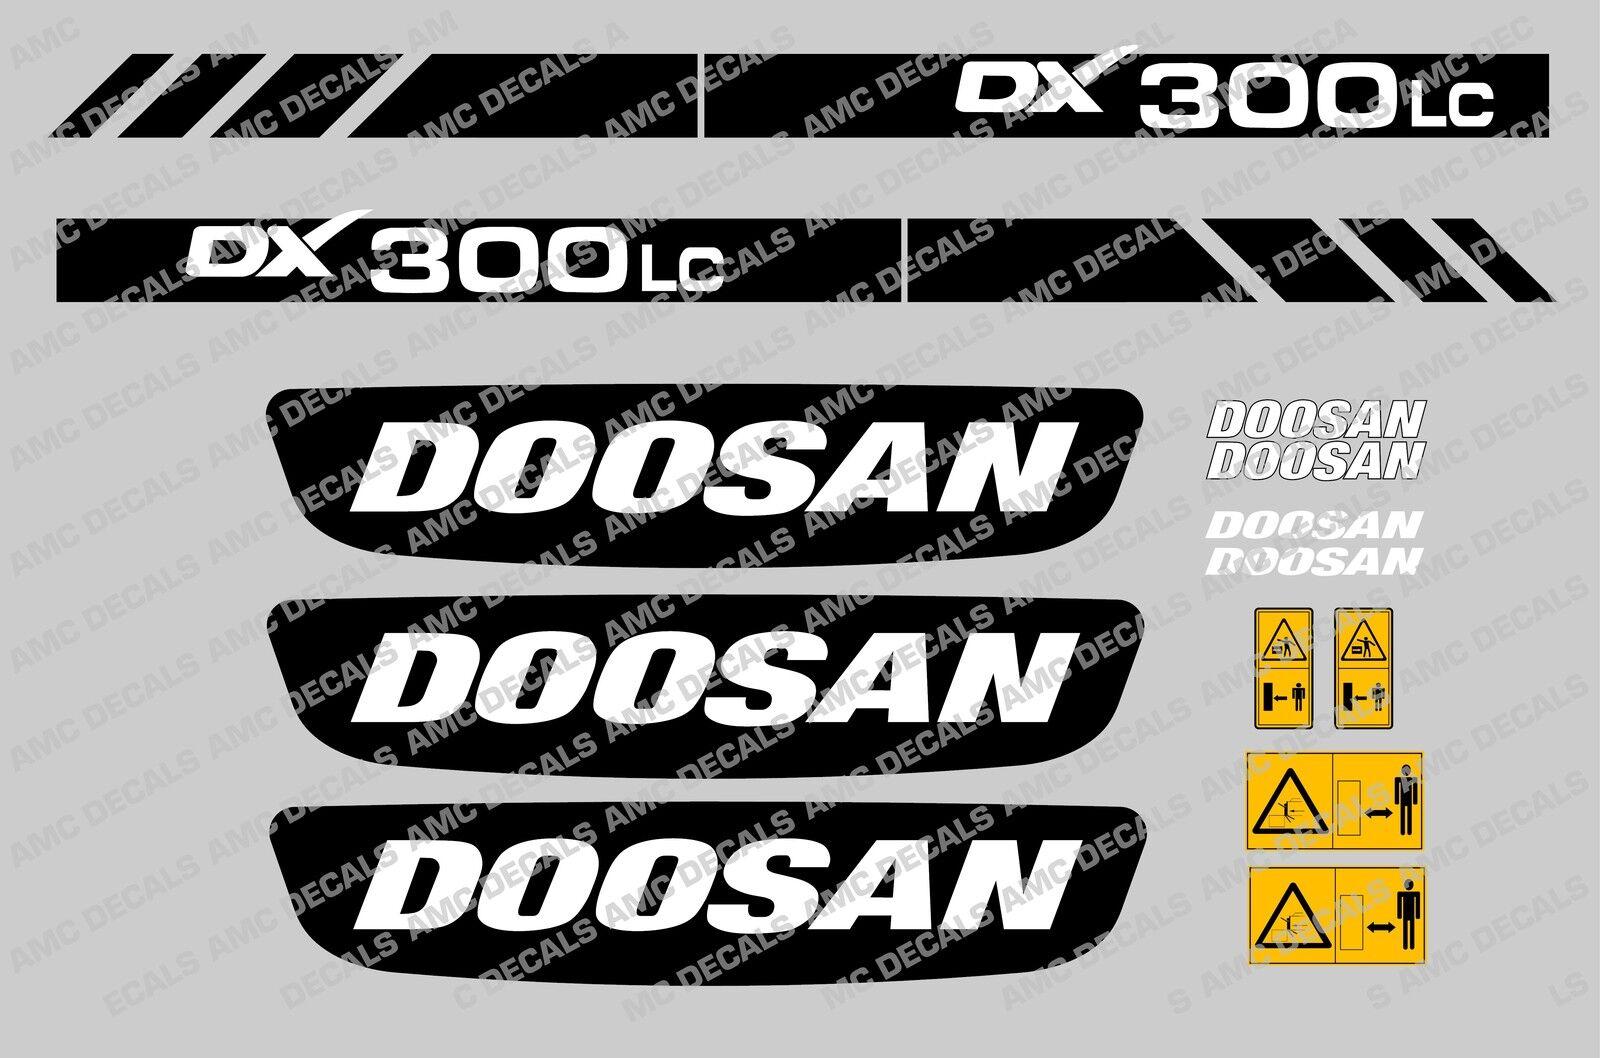 Doosan Dx300lc Digger Decal Sticker Set